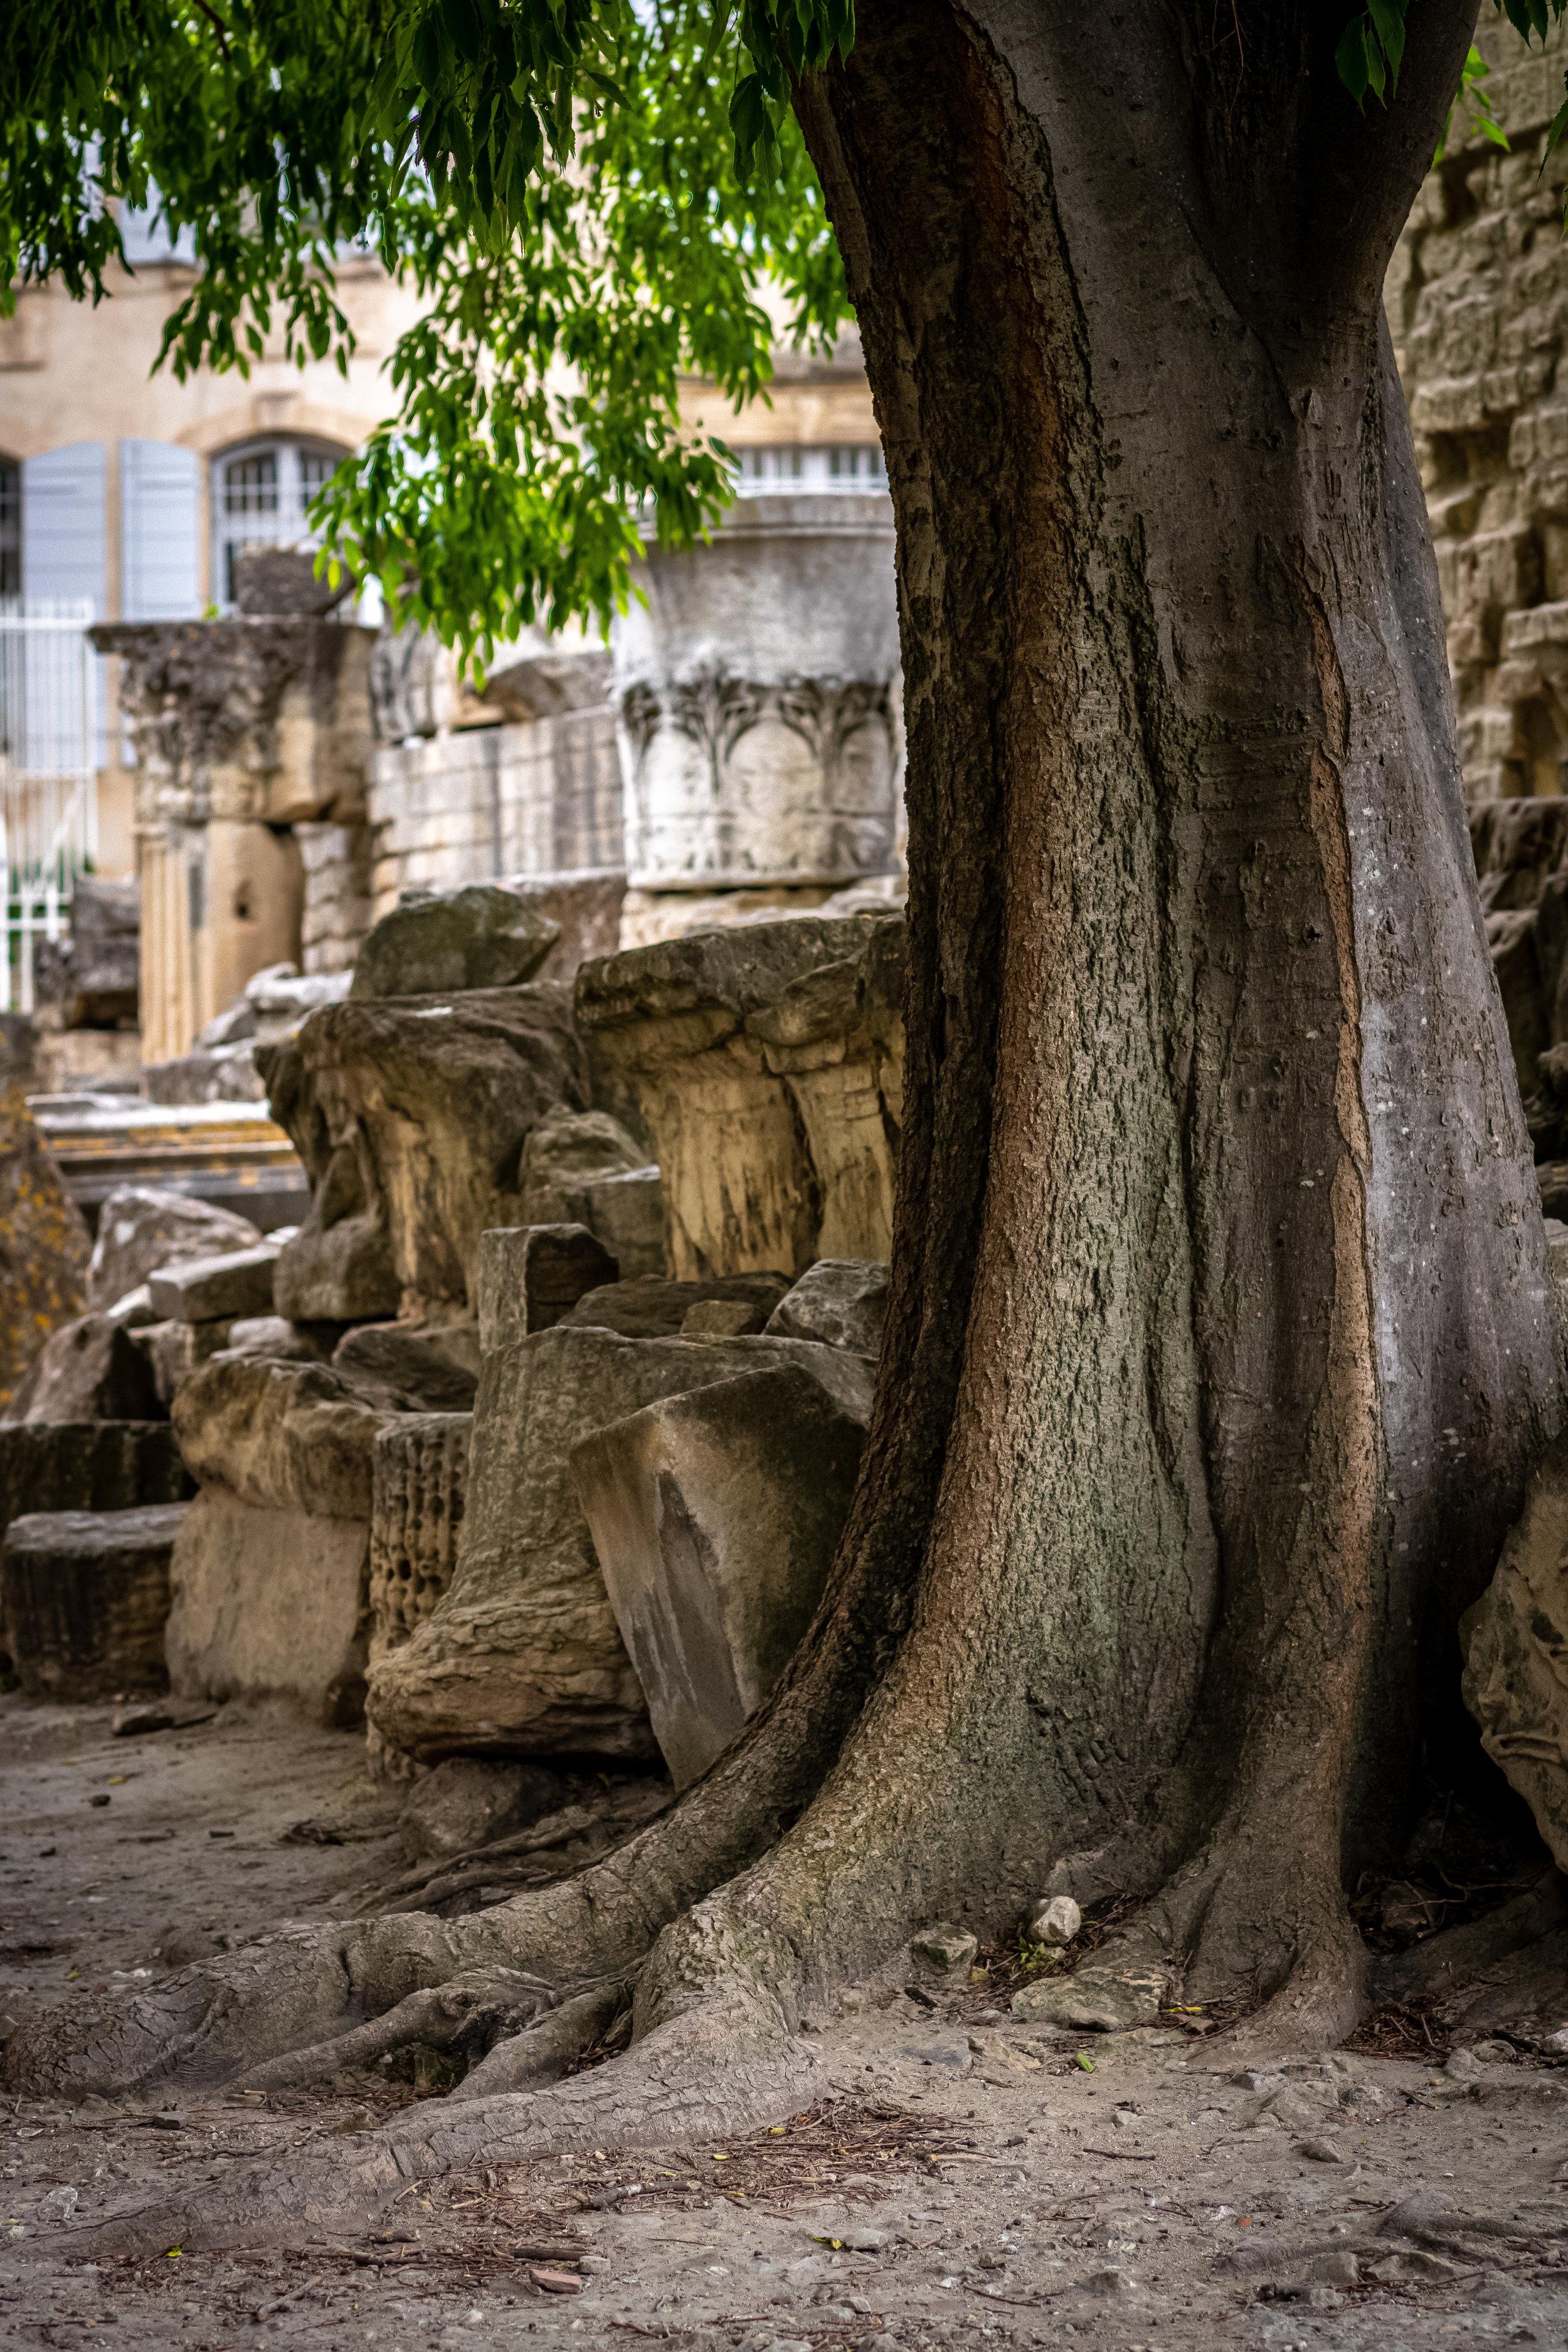 Tree, Roman Theatre, Arles, France